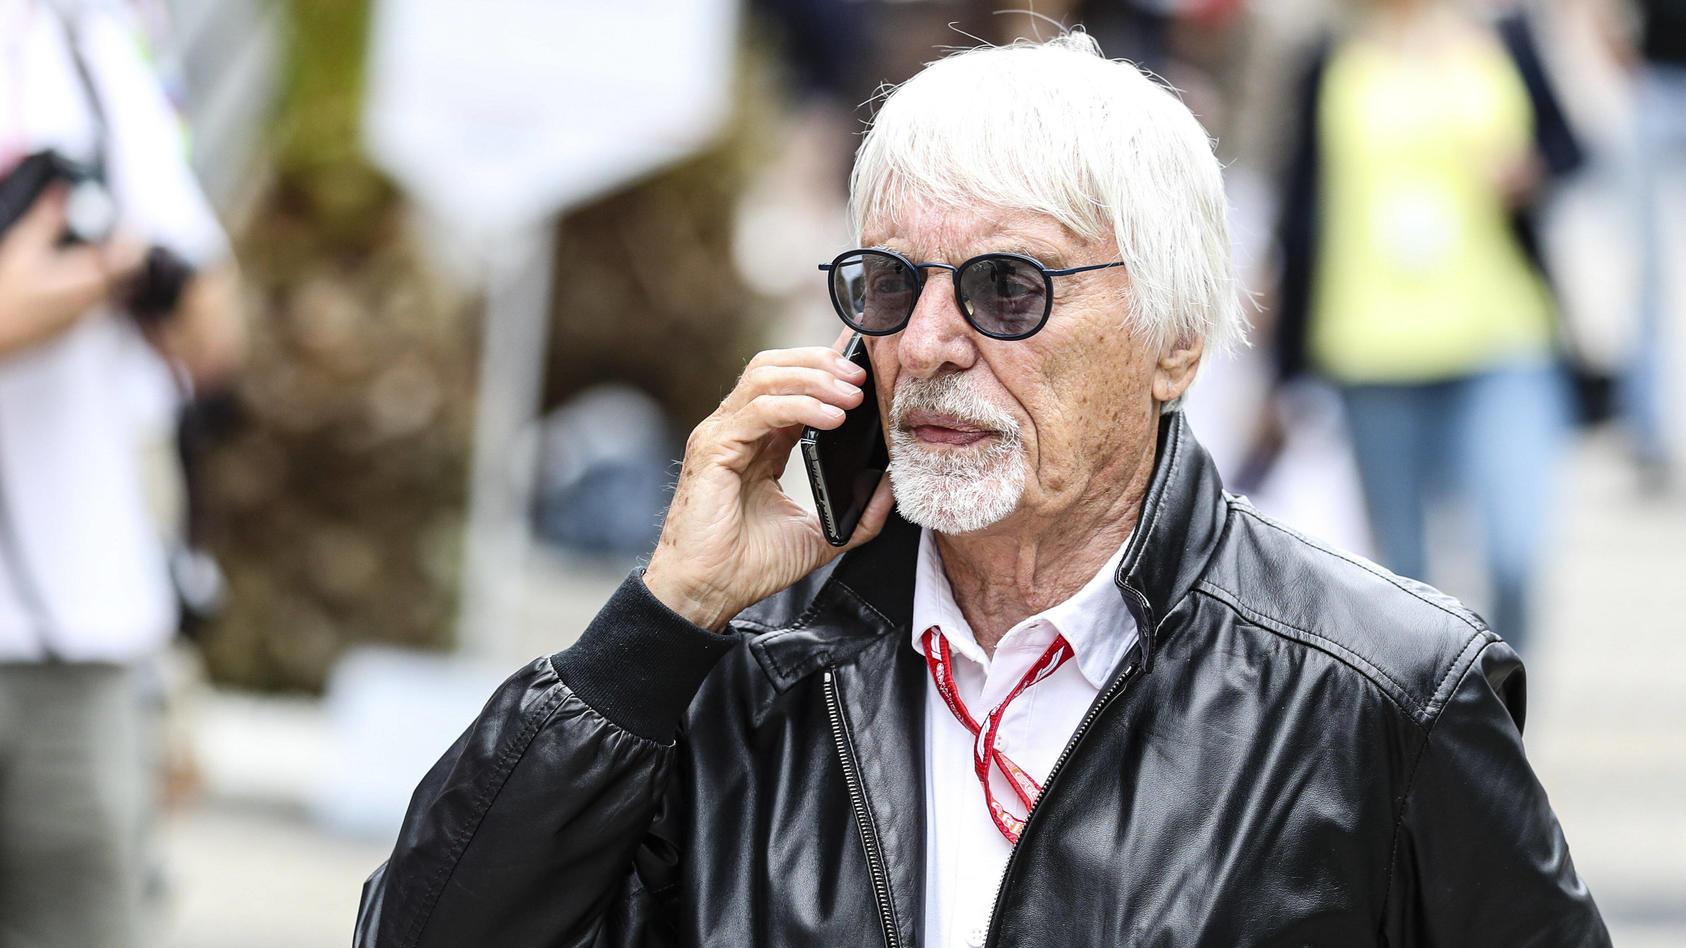 Motorsports: FIA Formula One World Championship, WM, Weltmeisterschaft 2019, Grand Prix of Russia, Bernie Ecclestone (G